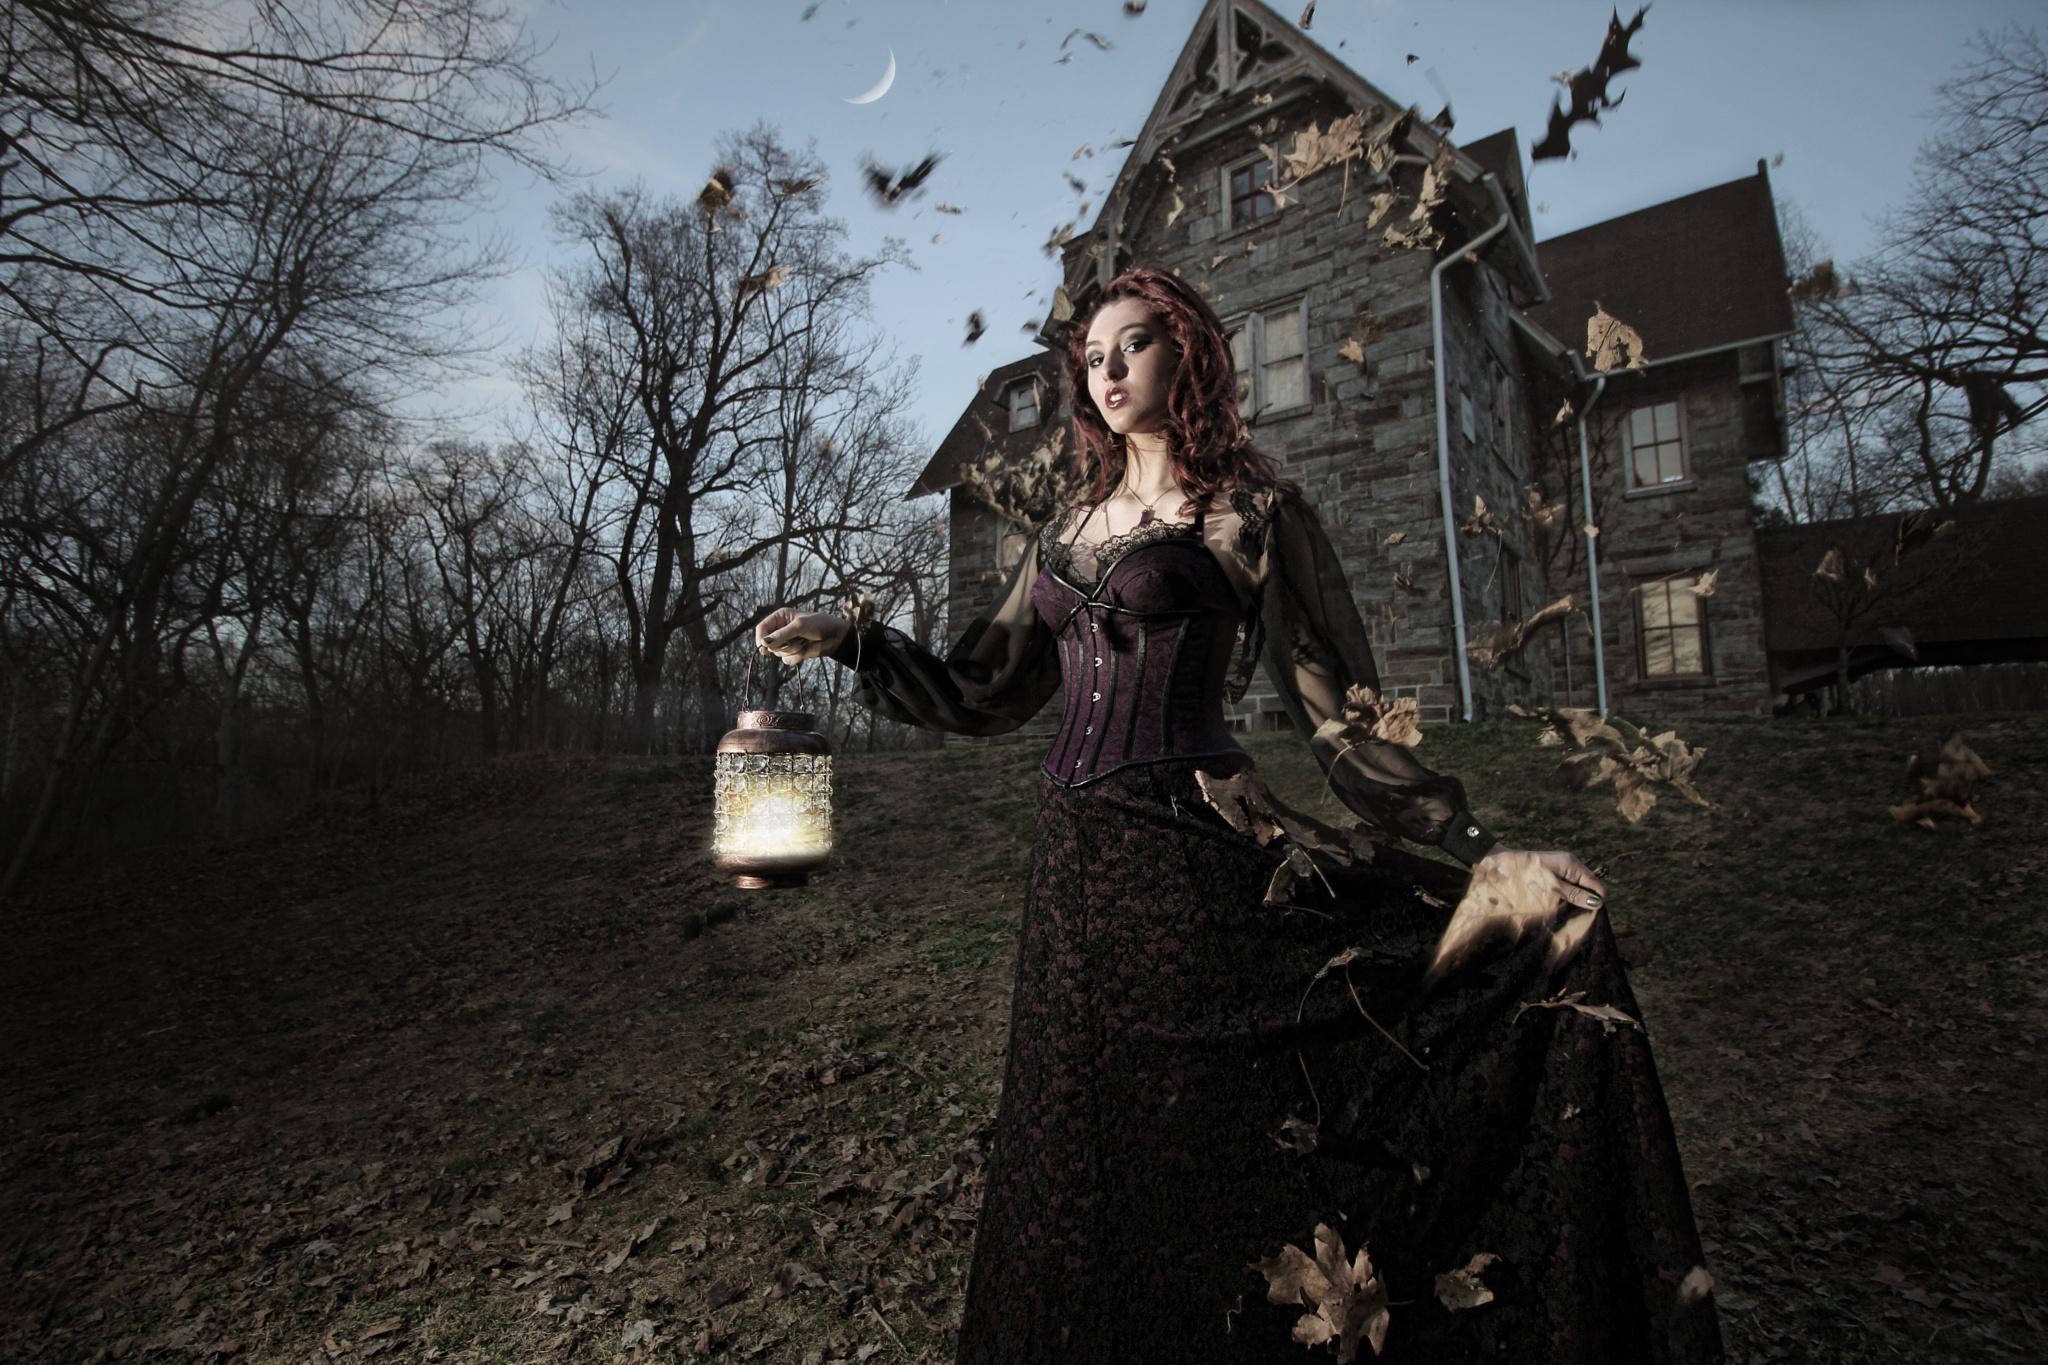 Caroline in Wonderland by Ultravphotography